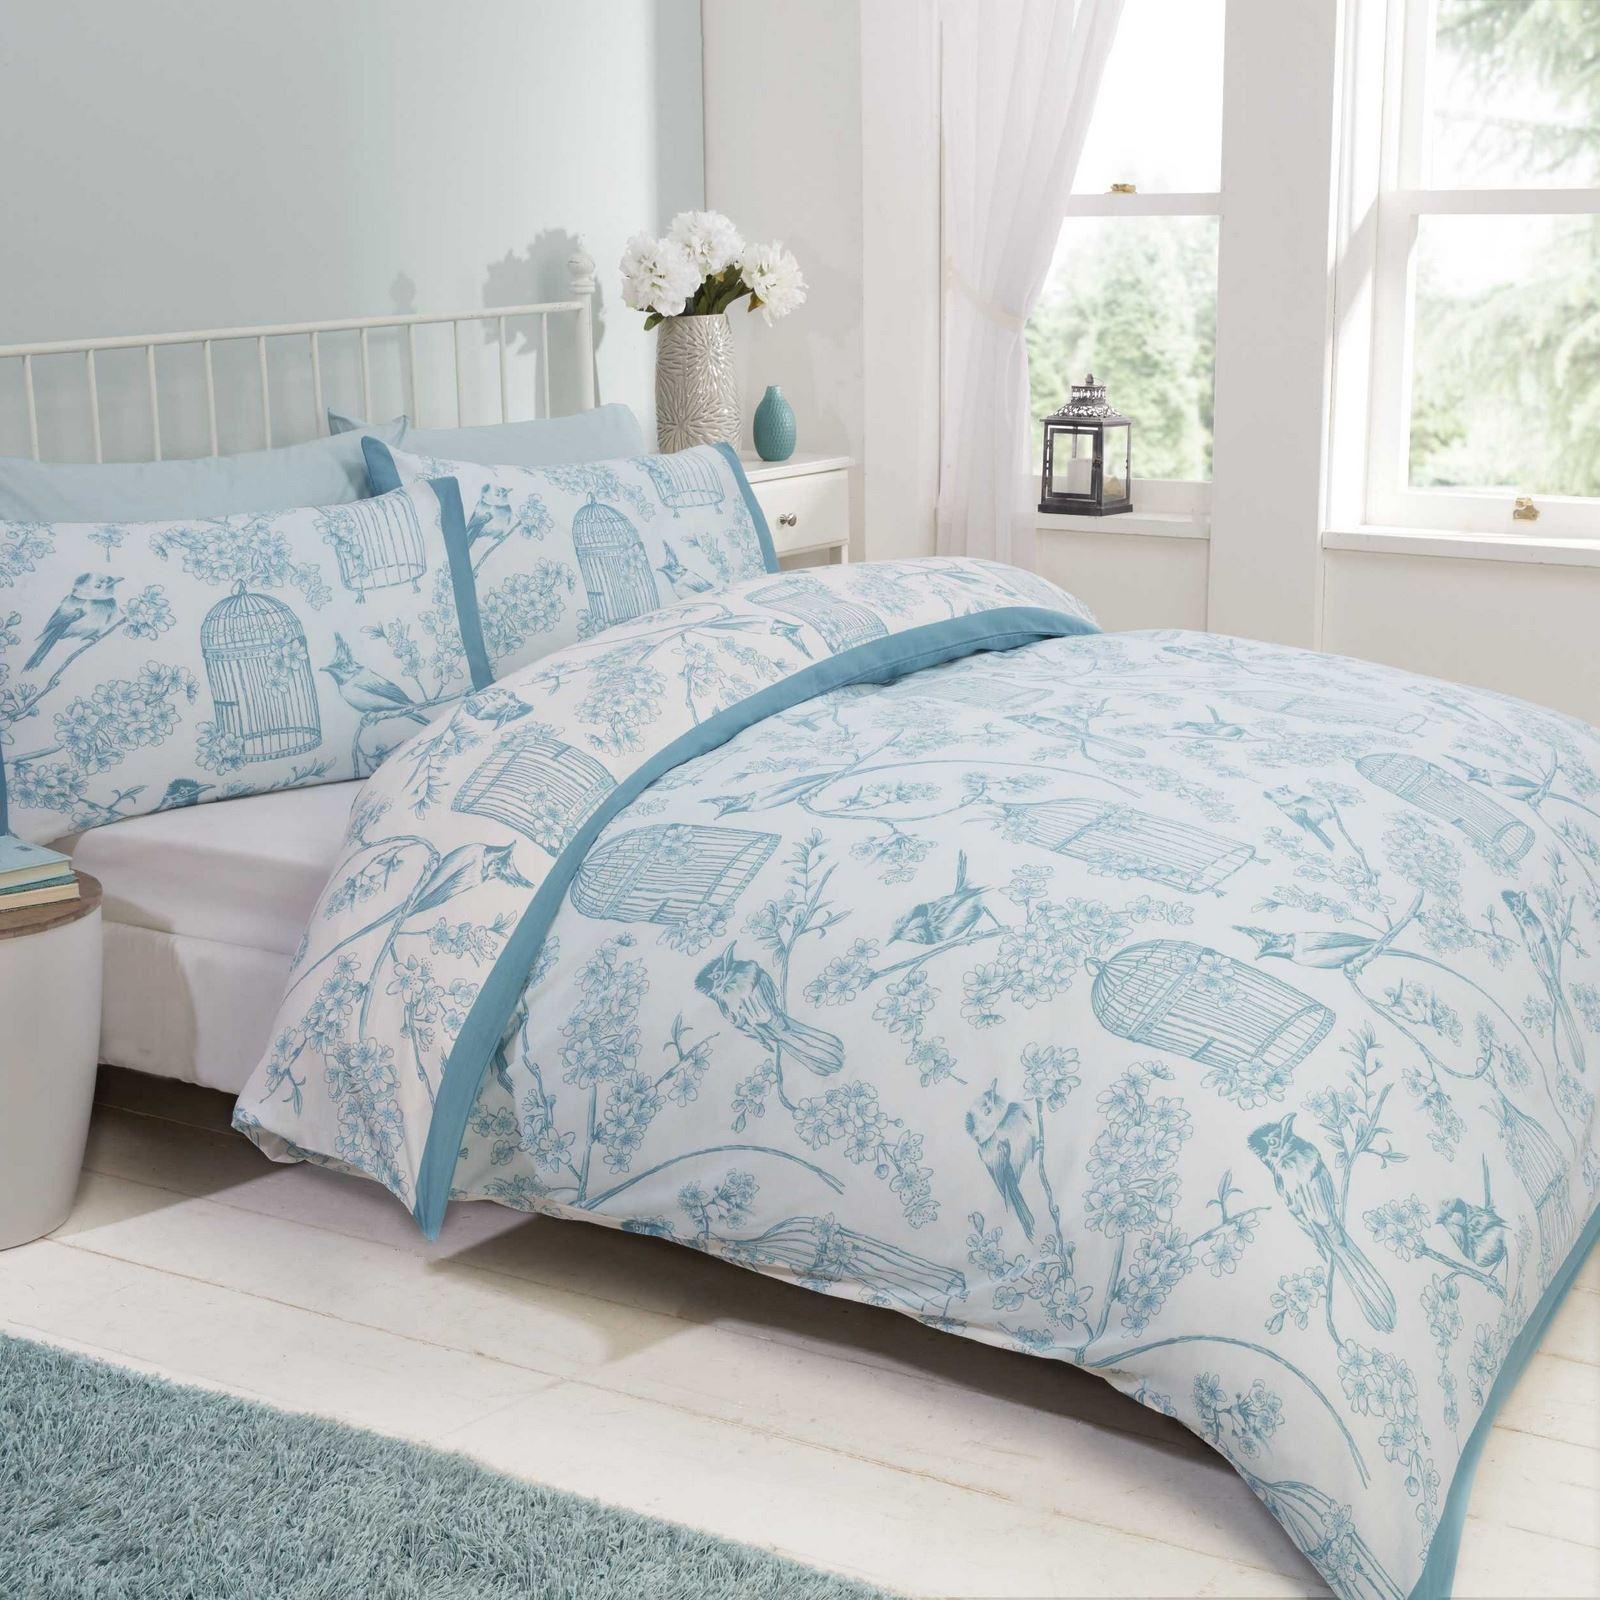 Floral Quilt Duvet Cover Amp Pillowcase Bedding Bed Set